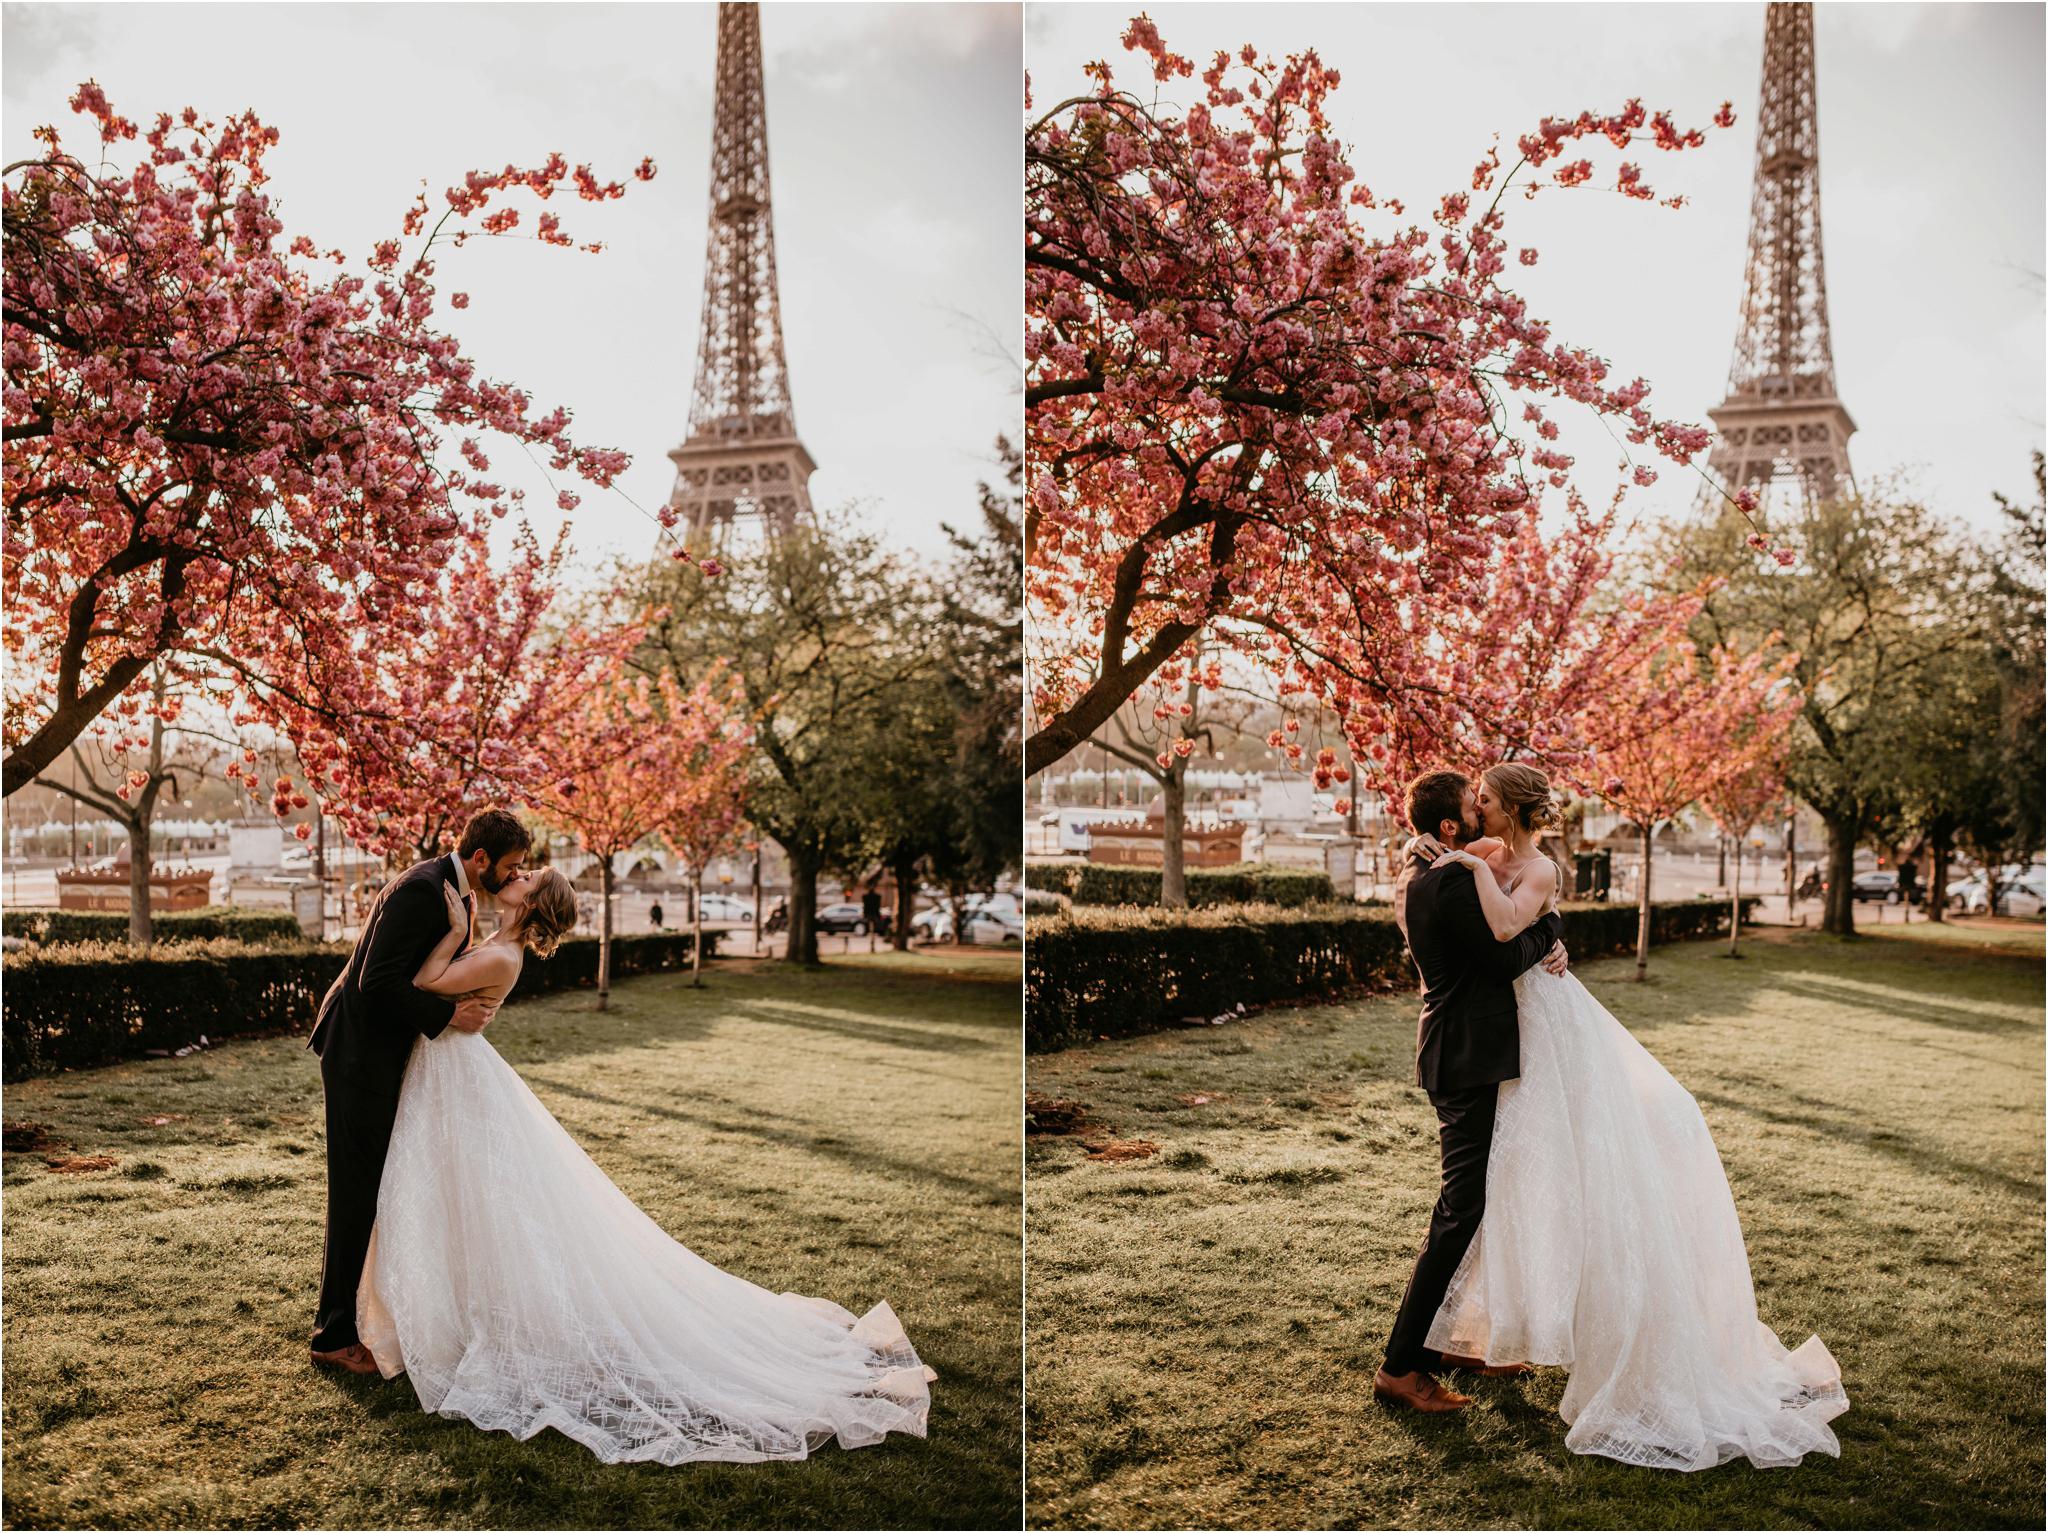 miranda-and-jared-paris-elopement-destination-wedding-photographer-039.jpg